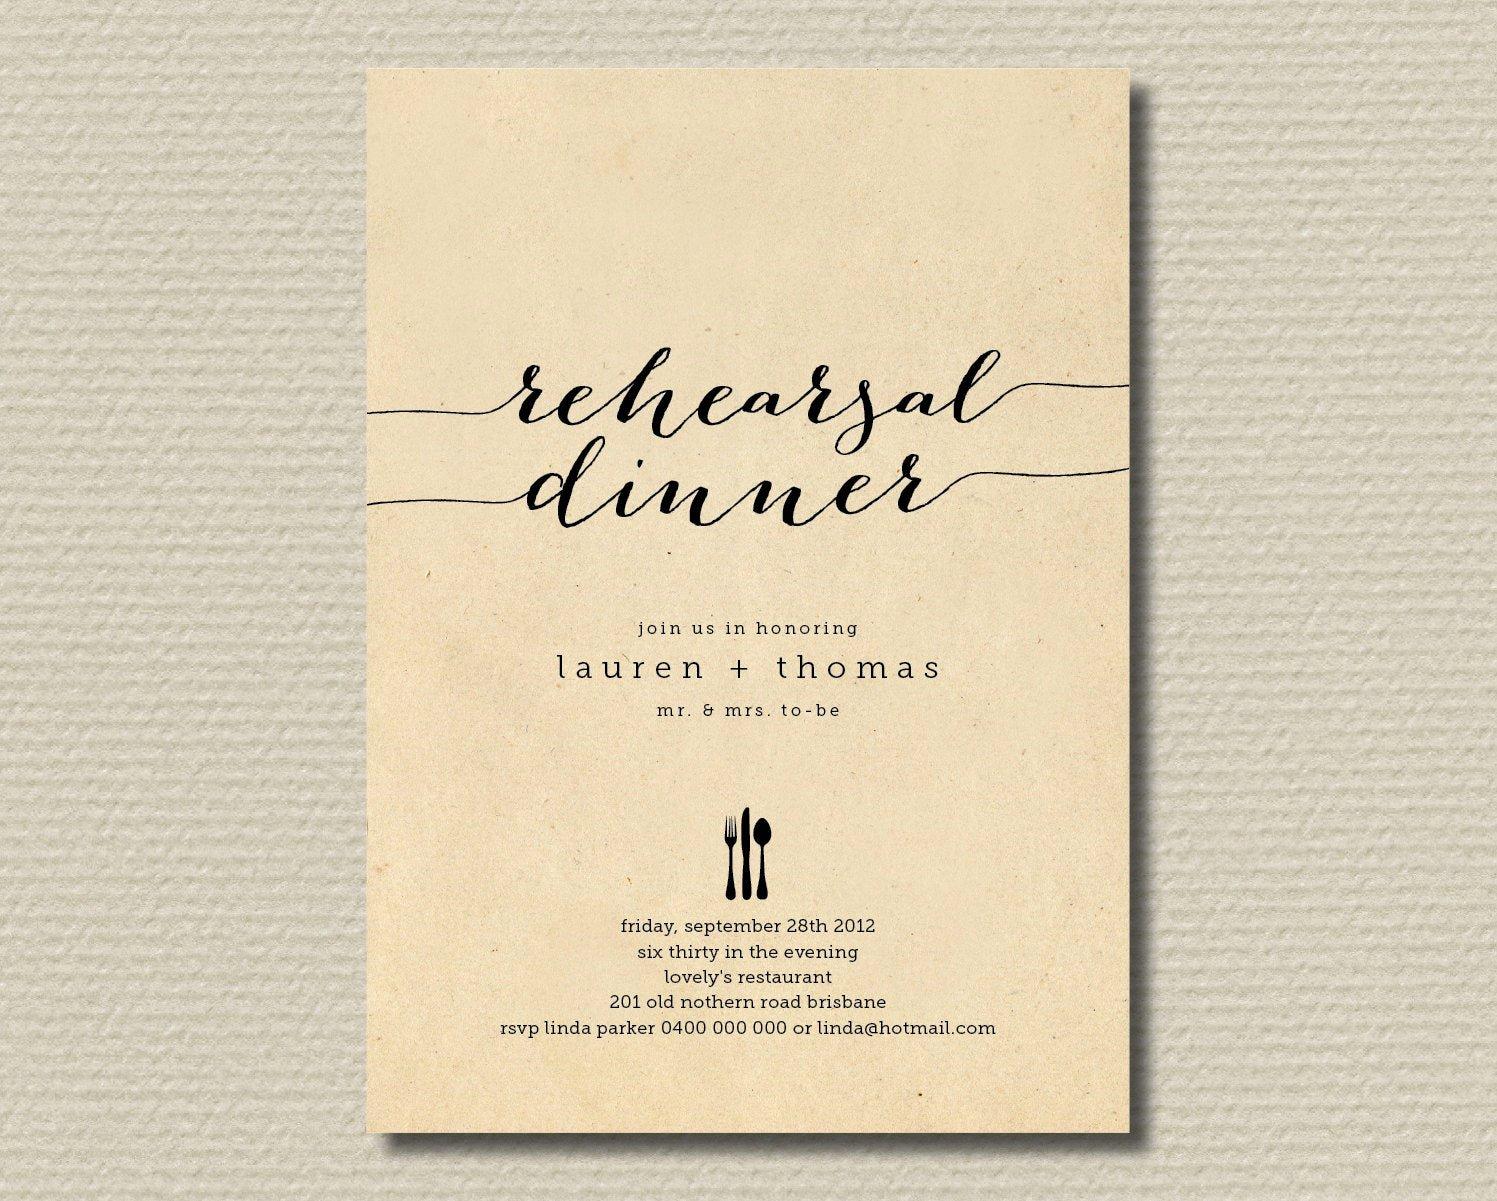 Invitation Message for Dinner Lovely Printable Wedding Rehearsal Dinner Invitation by